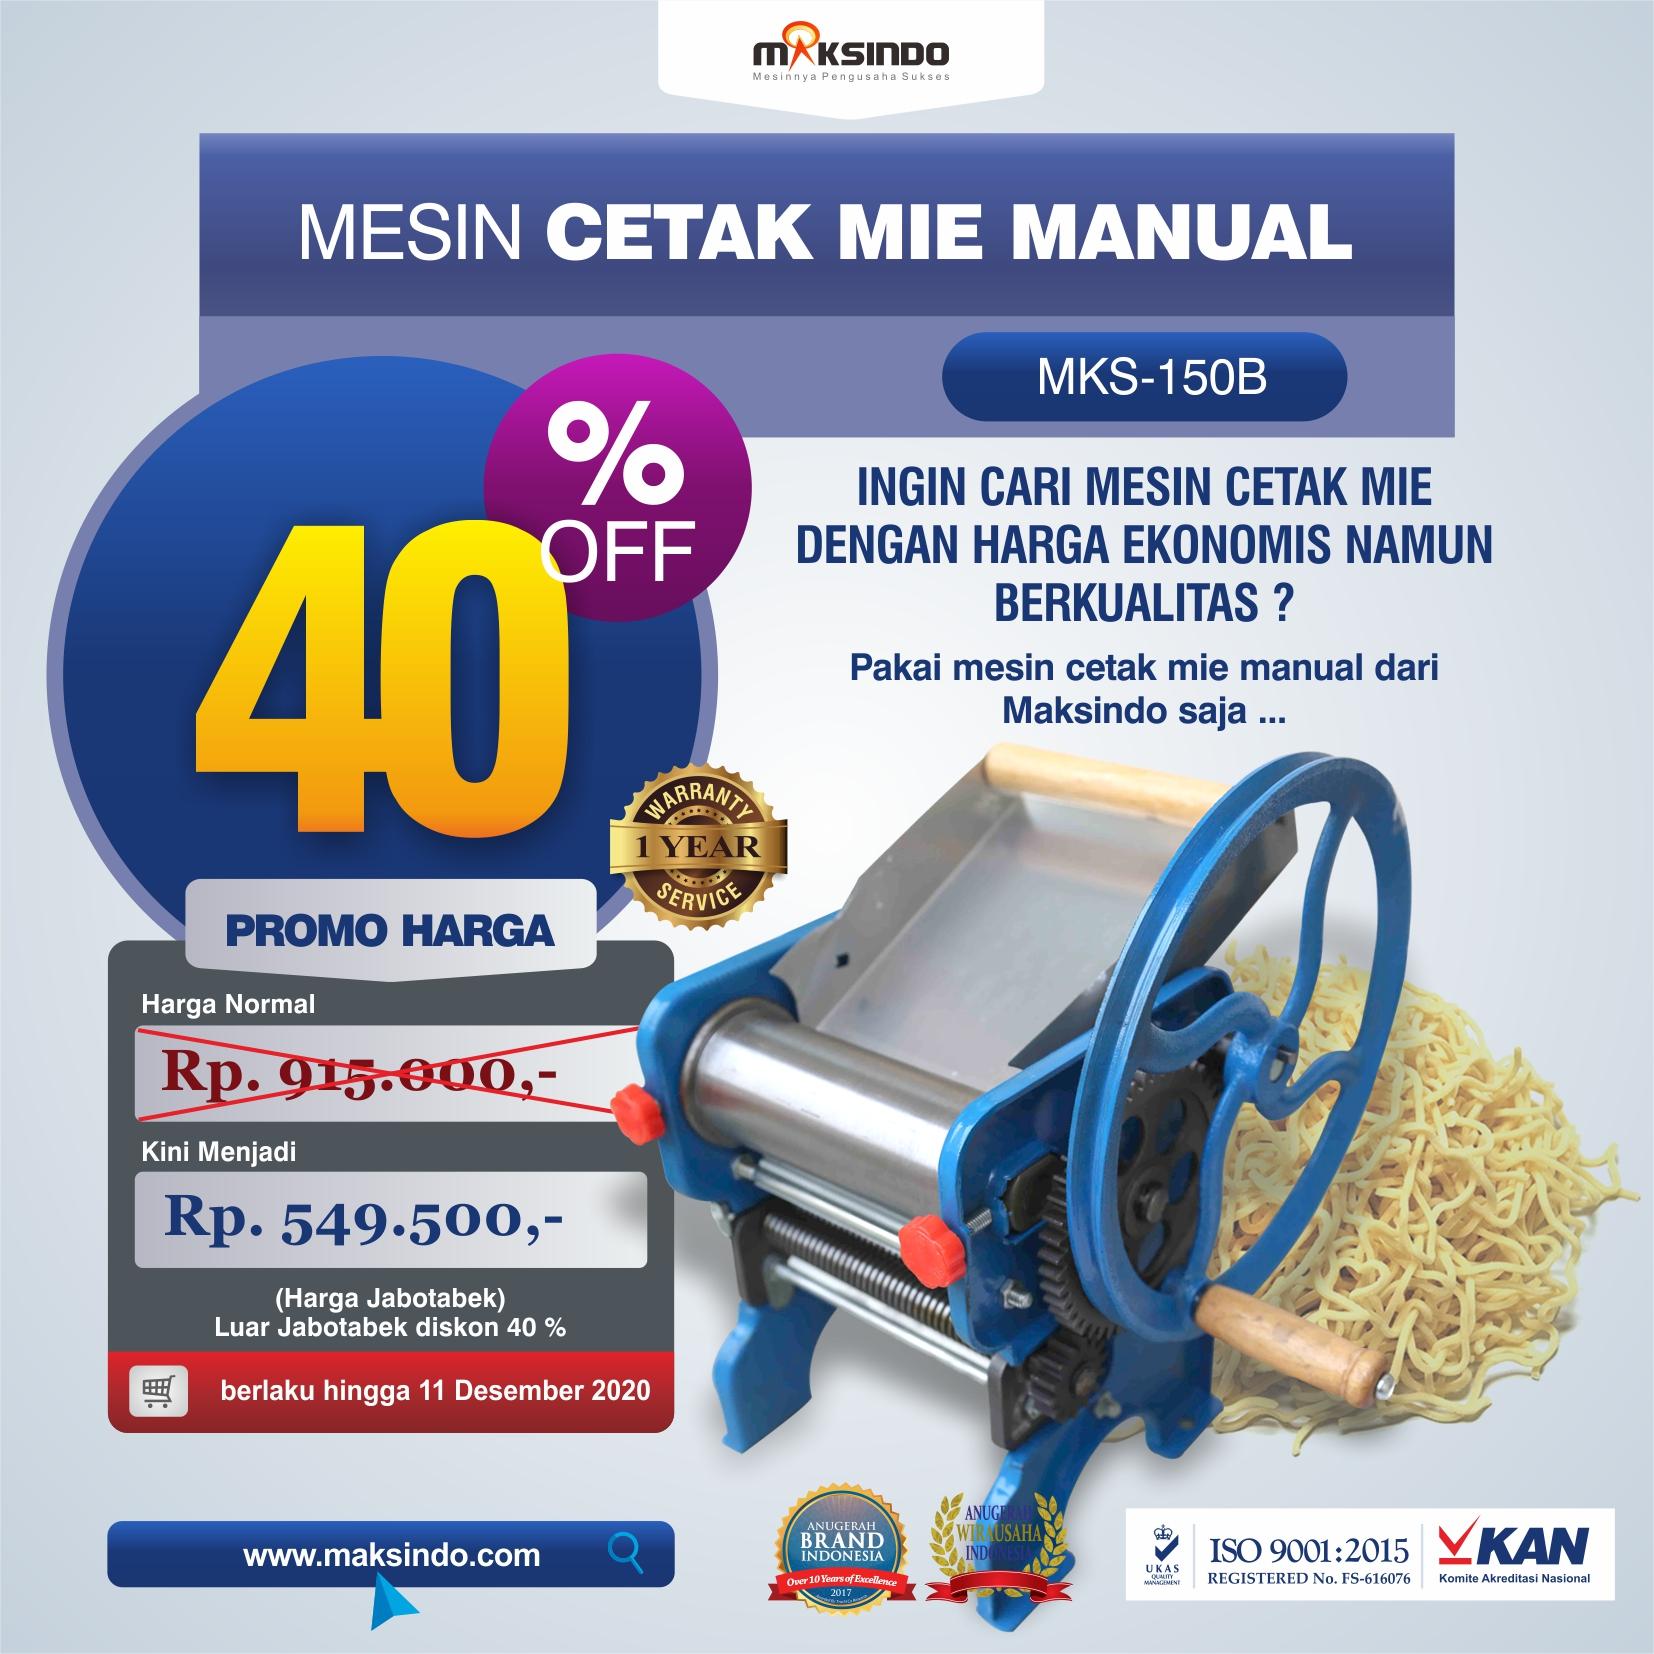 Jual Cetak Mie Manual Untuk Usaha (MKS-150B) di Malang